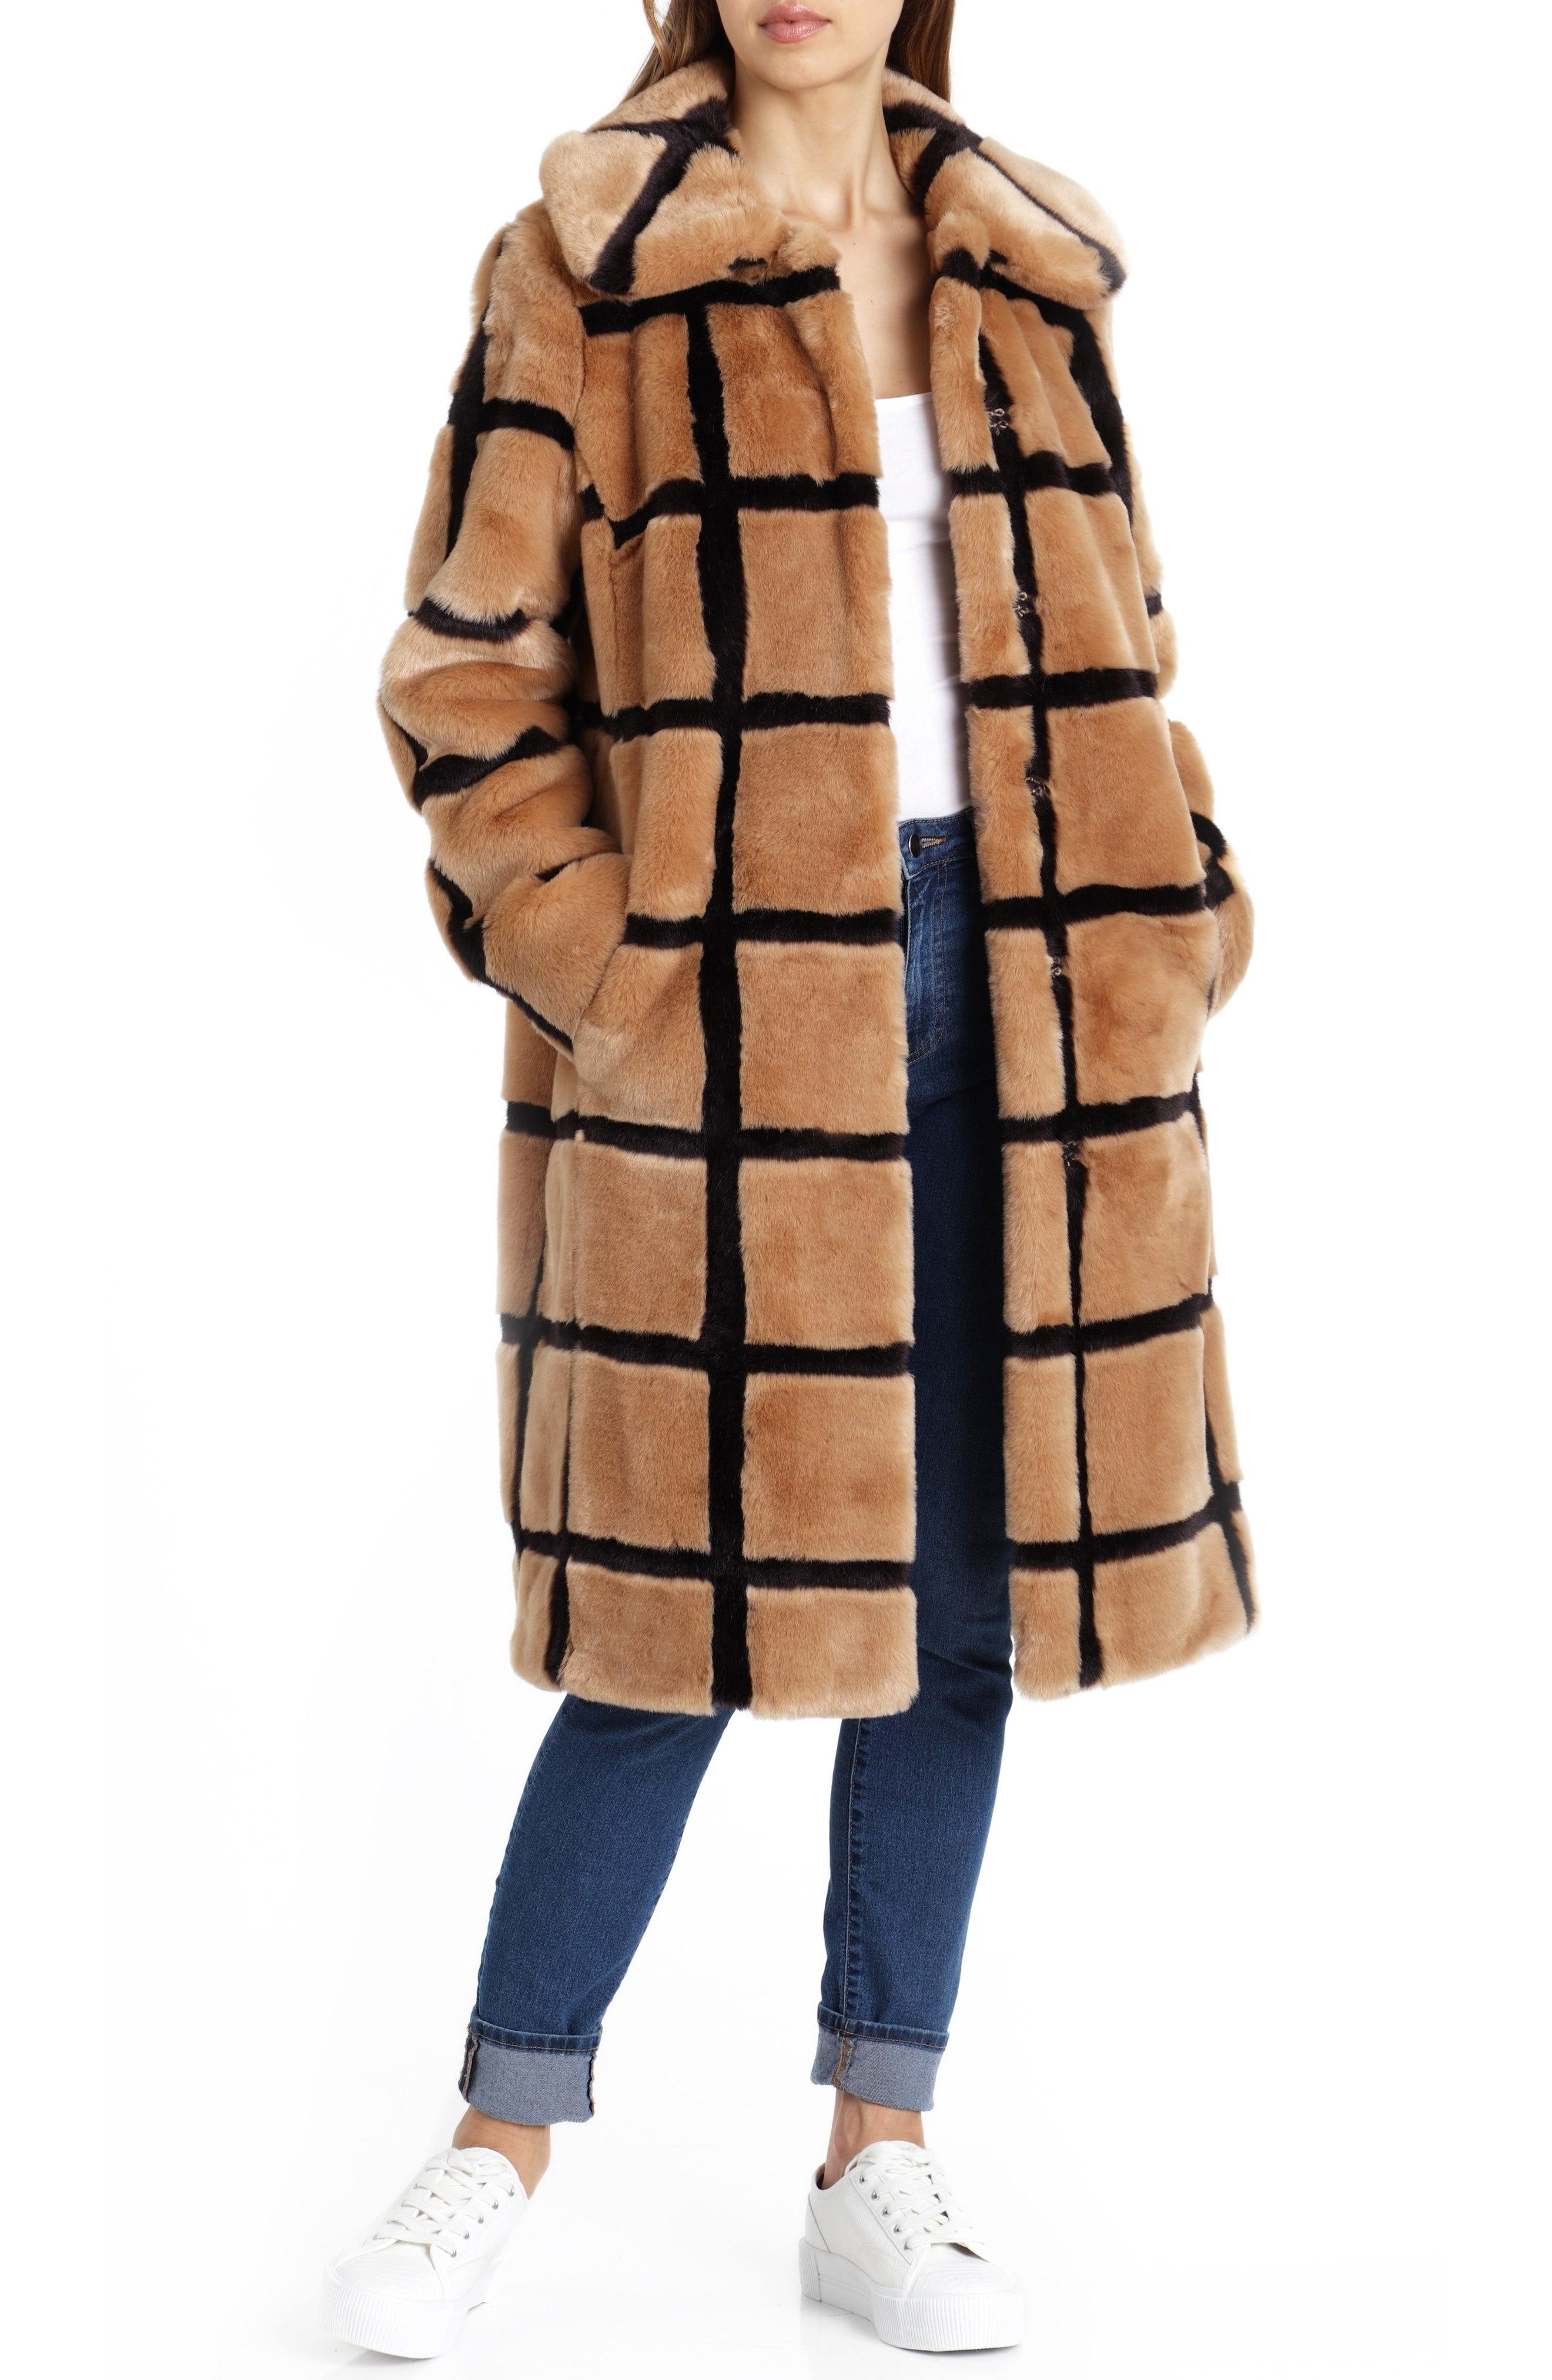 f53fdb4d77c45 Cheap Faux Fur Coats Jackets To Wear This Fall Winter